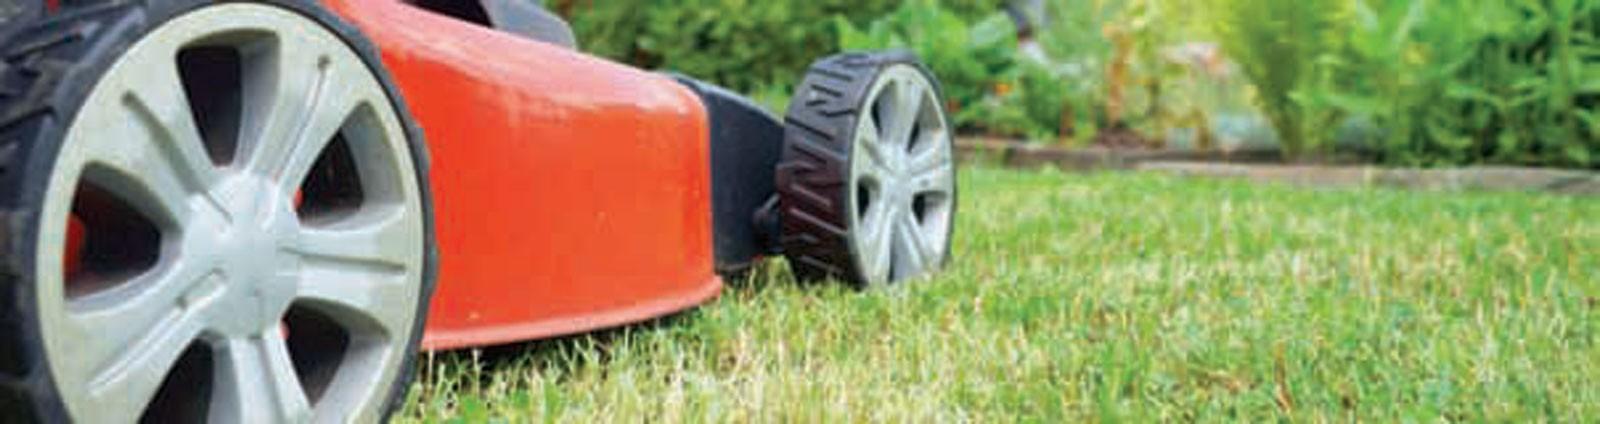 preparing a new lawn